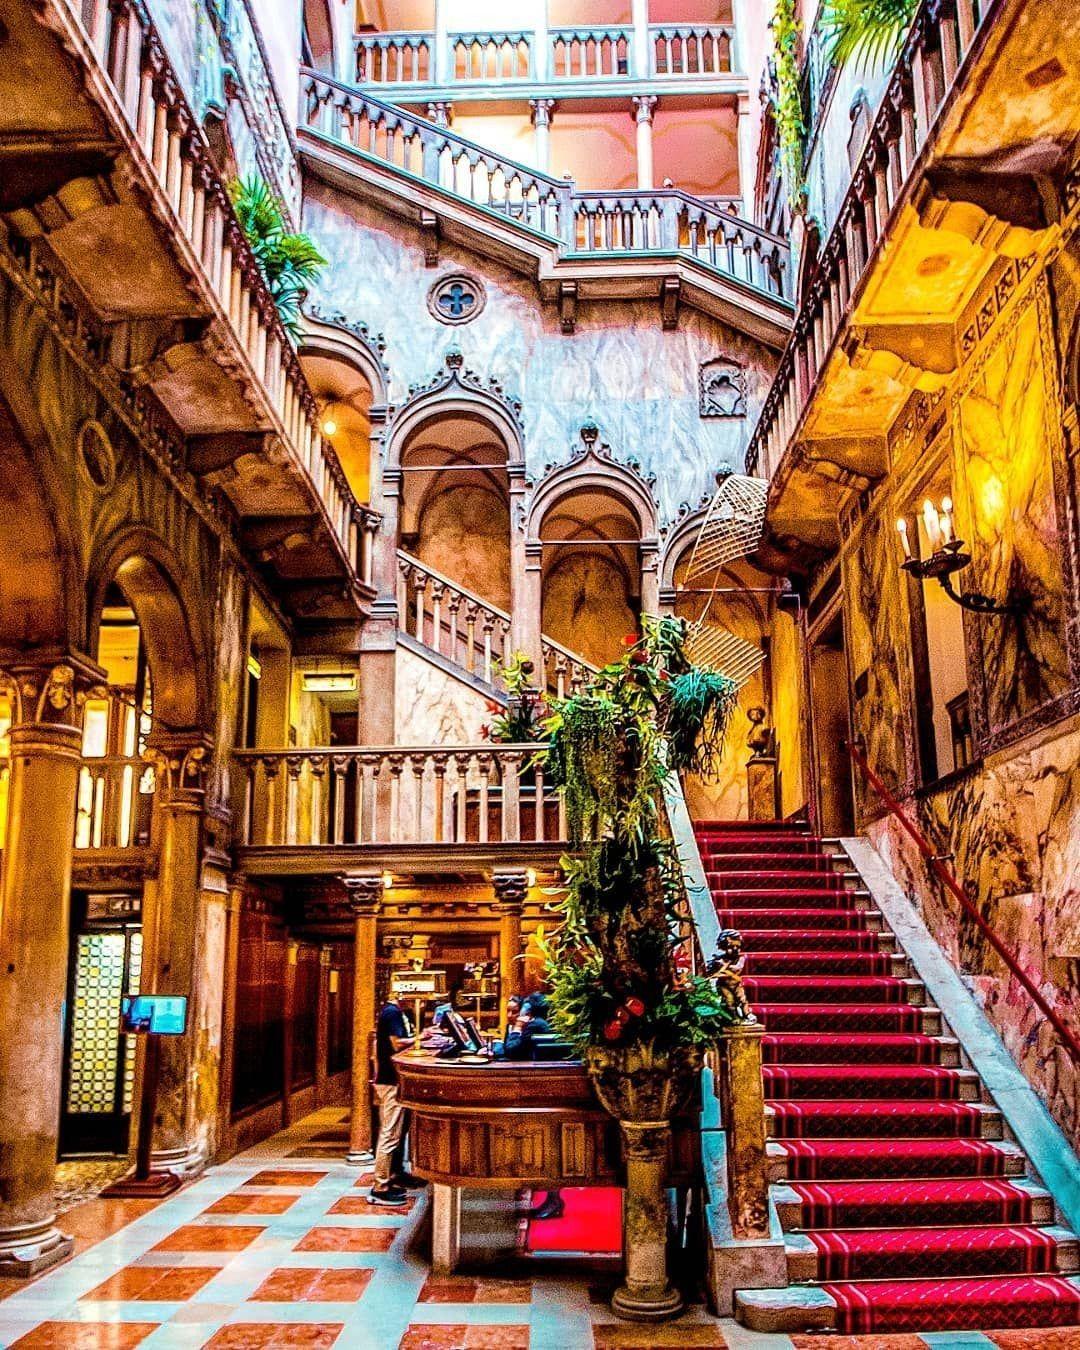 Hotel Danieli & Venice & italy...